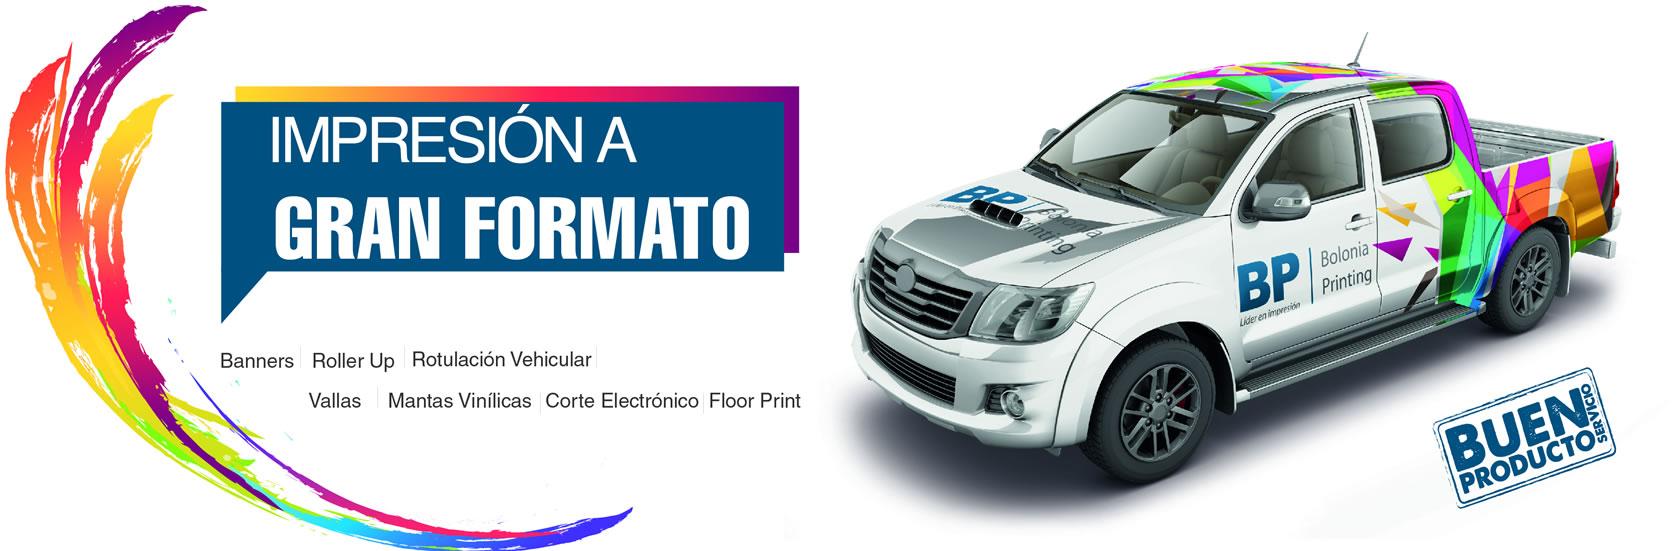 bolonia-printing-banner-03